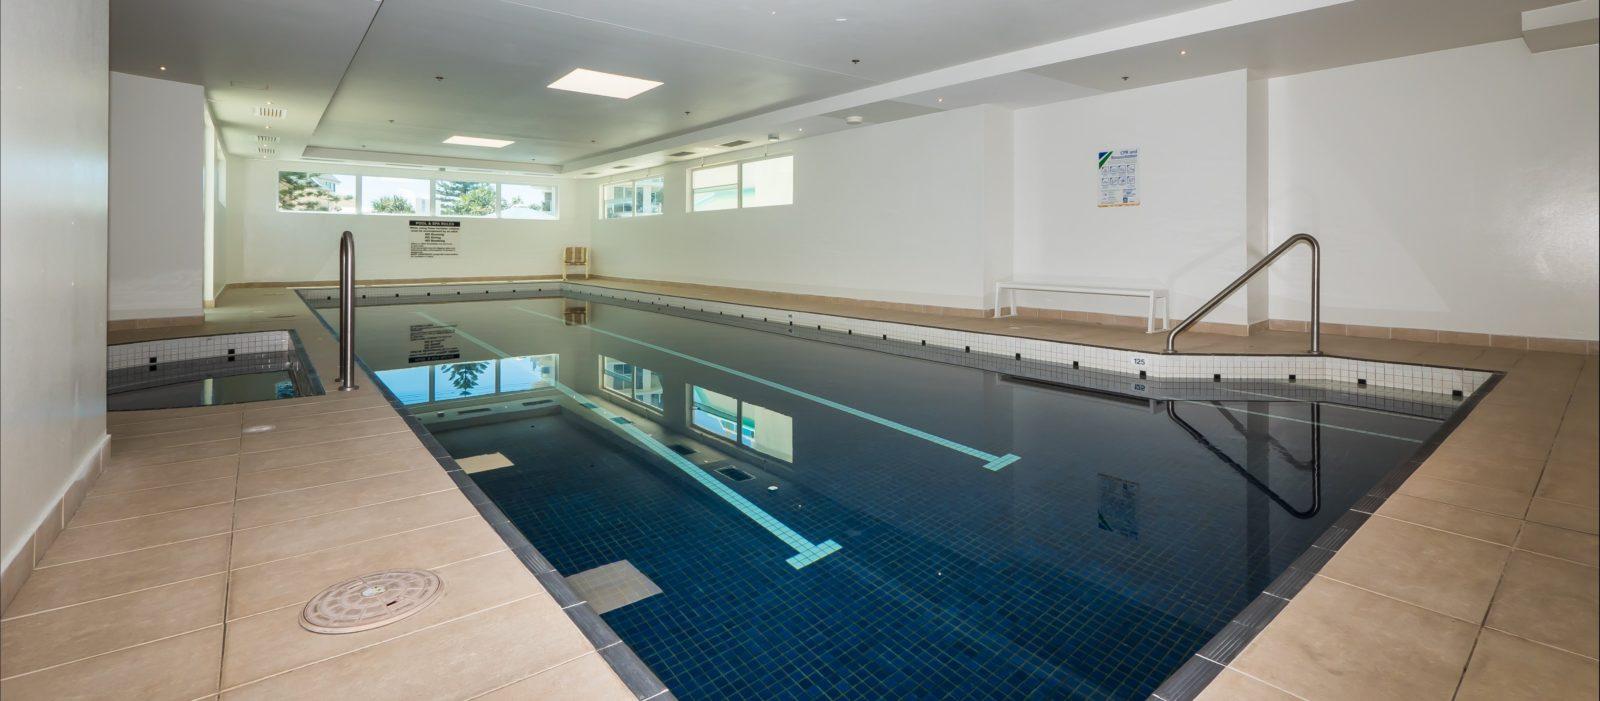 Indoor pool 14 metres in length